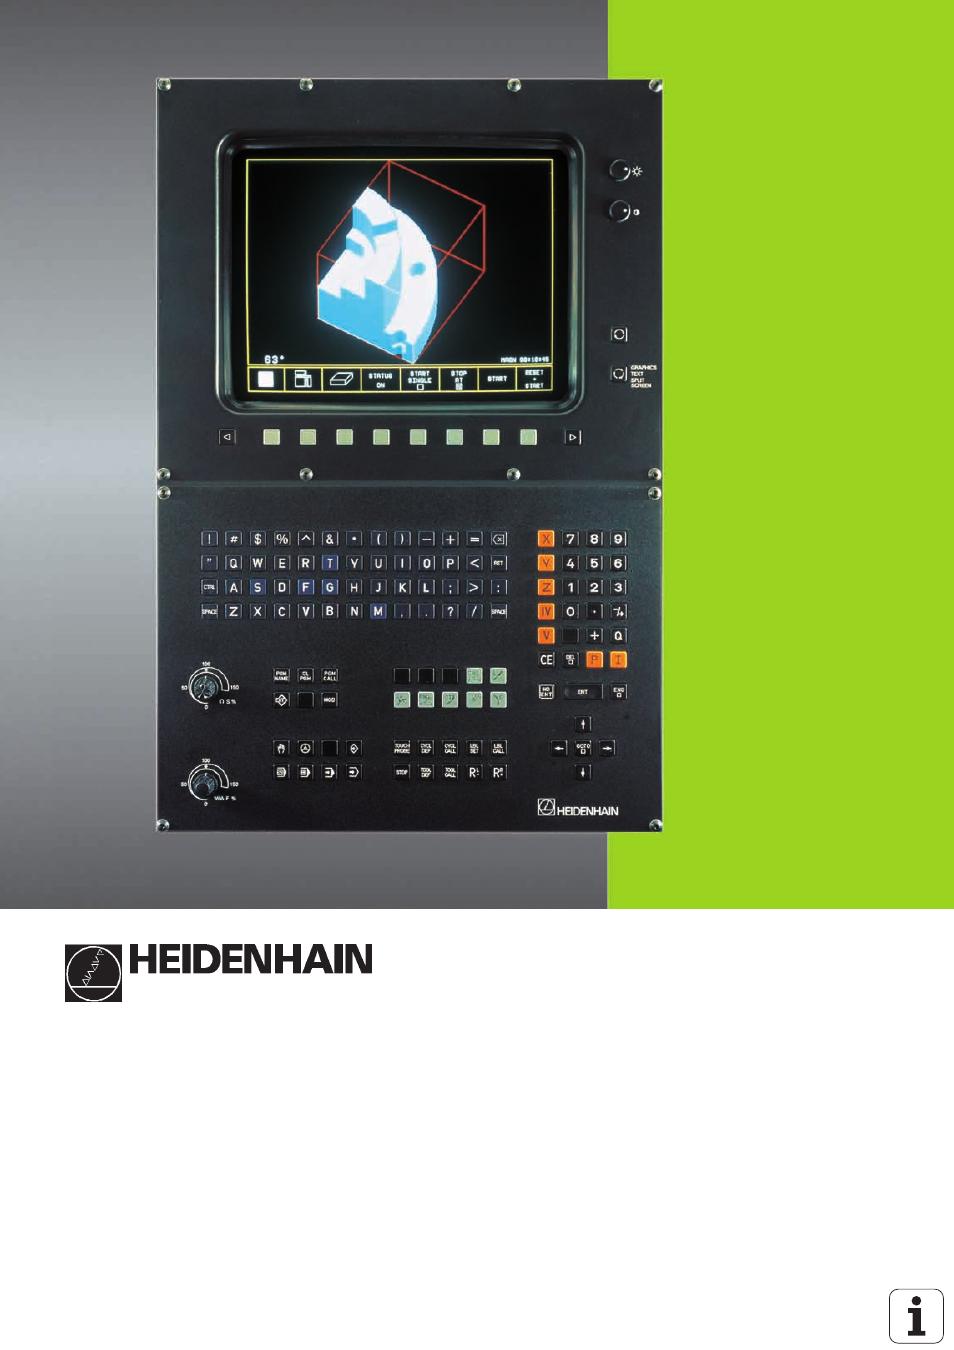 heidenhain tnc 407 280 580 iso programming user manual 333 pages rh manualsdir com Micros Programming Manual Mazatrol Programming Manual